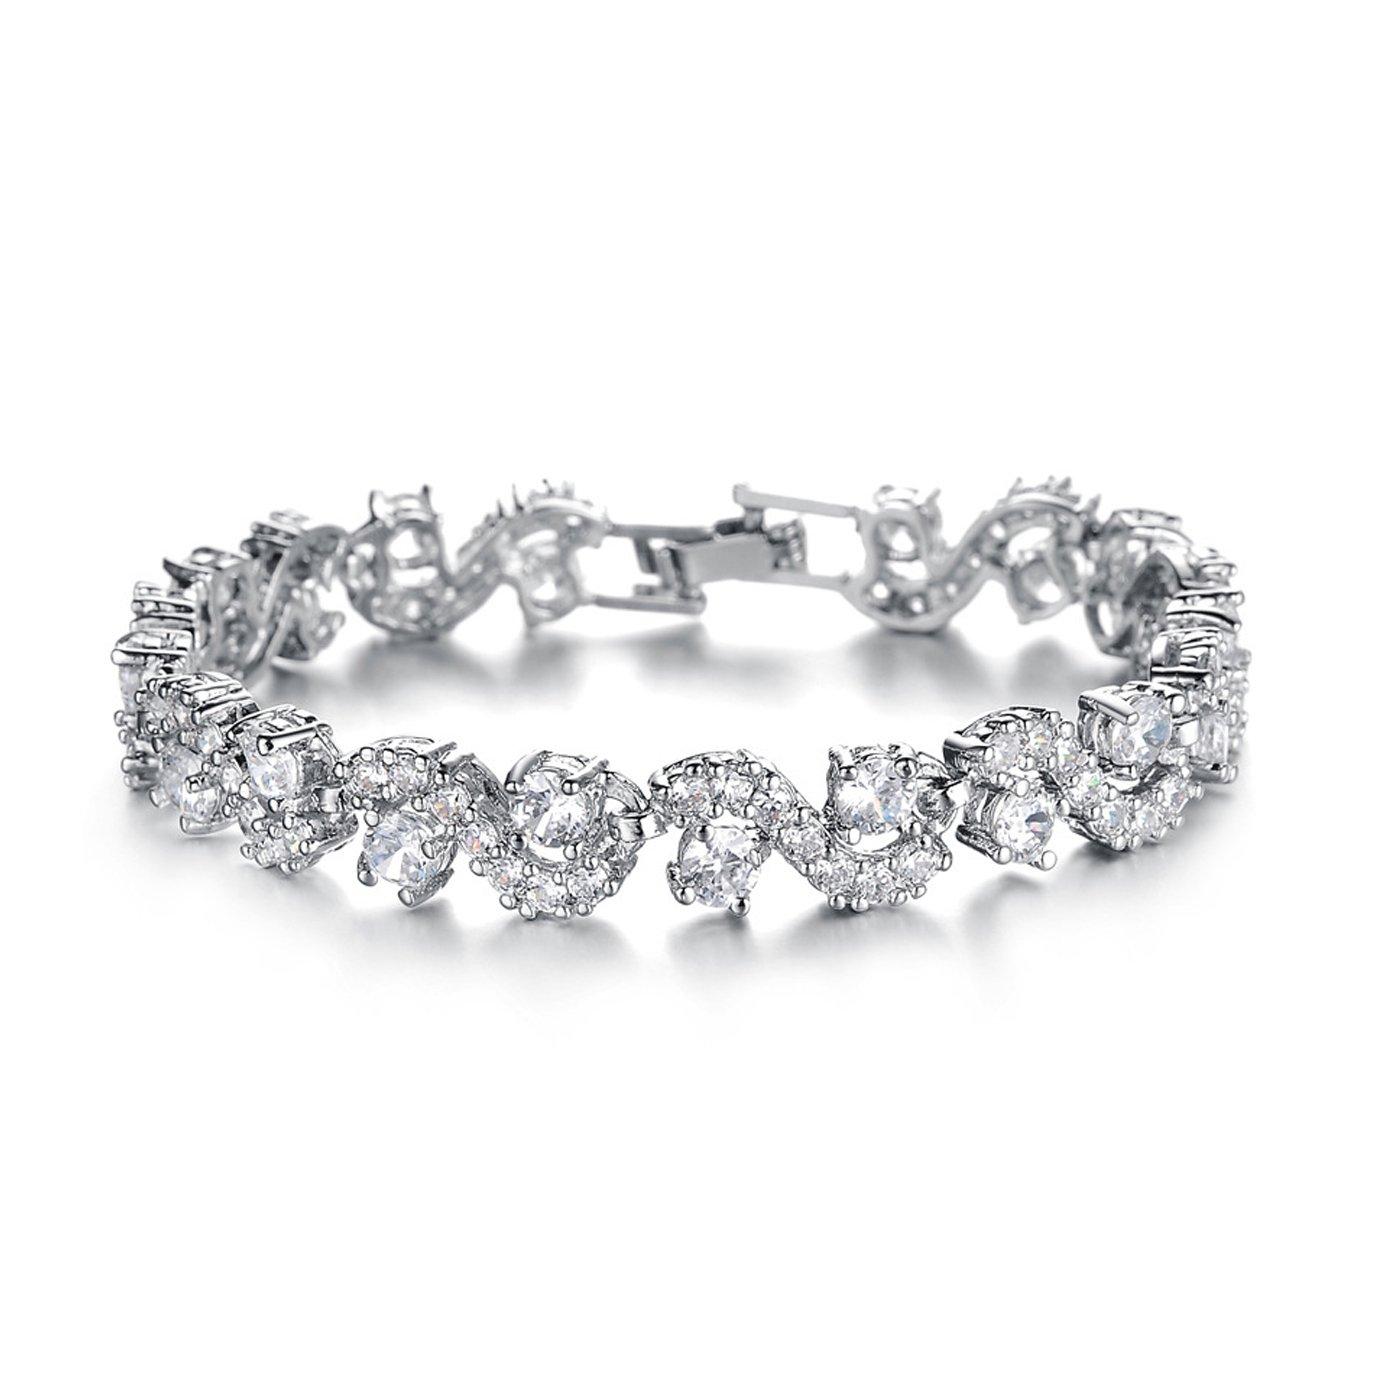 T-PERFECT LIFE 18K Platinum-plated Swarovski Element AAA Cubic Zirconia Bracelet for Women Elegent Crystals Wedding Jewelry (6.6 inch white)